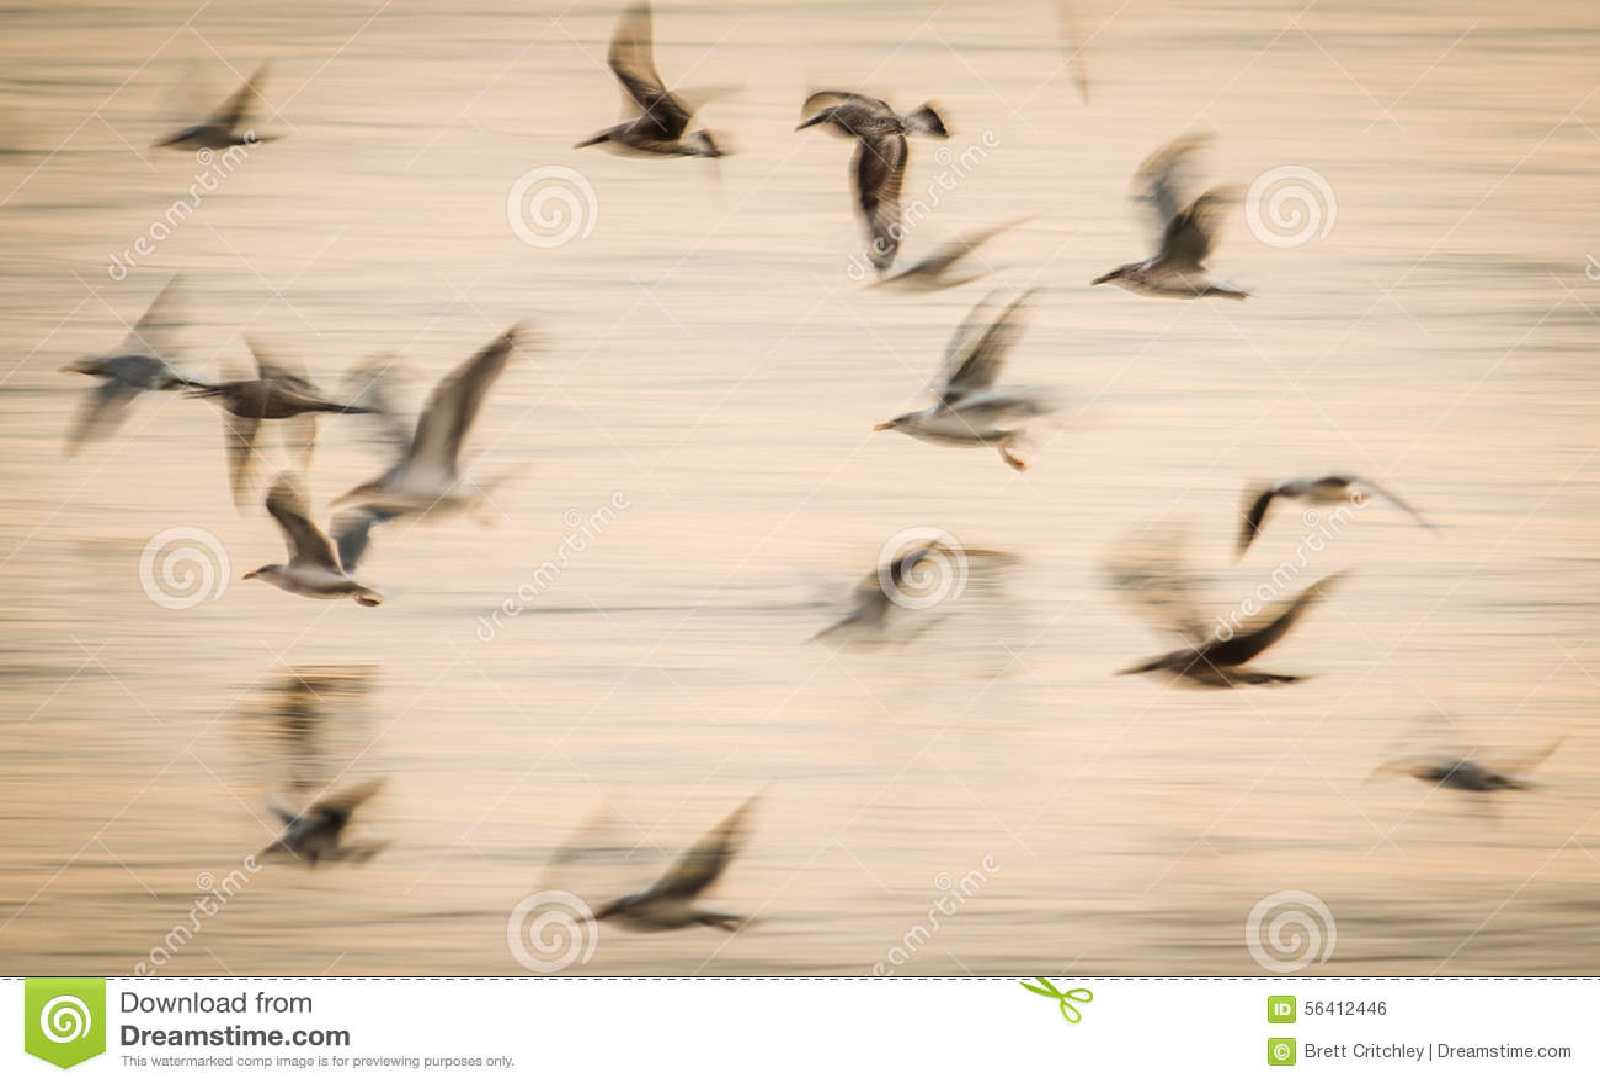 Abstract birds flight speed movement